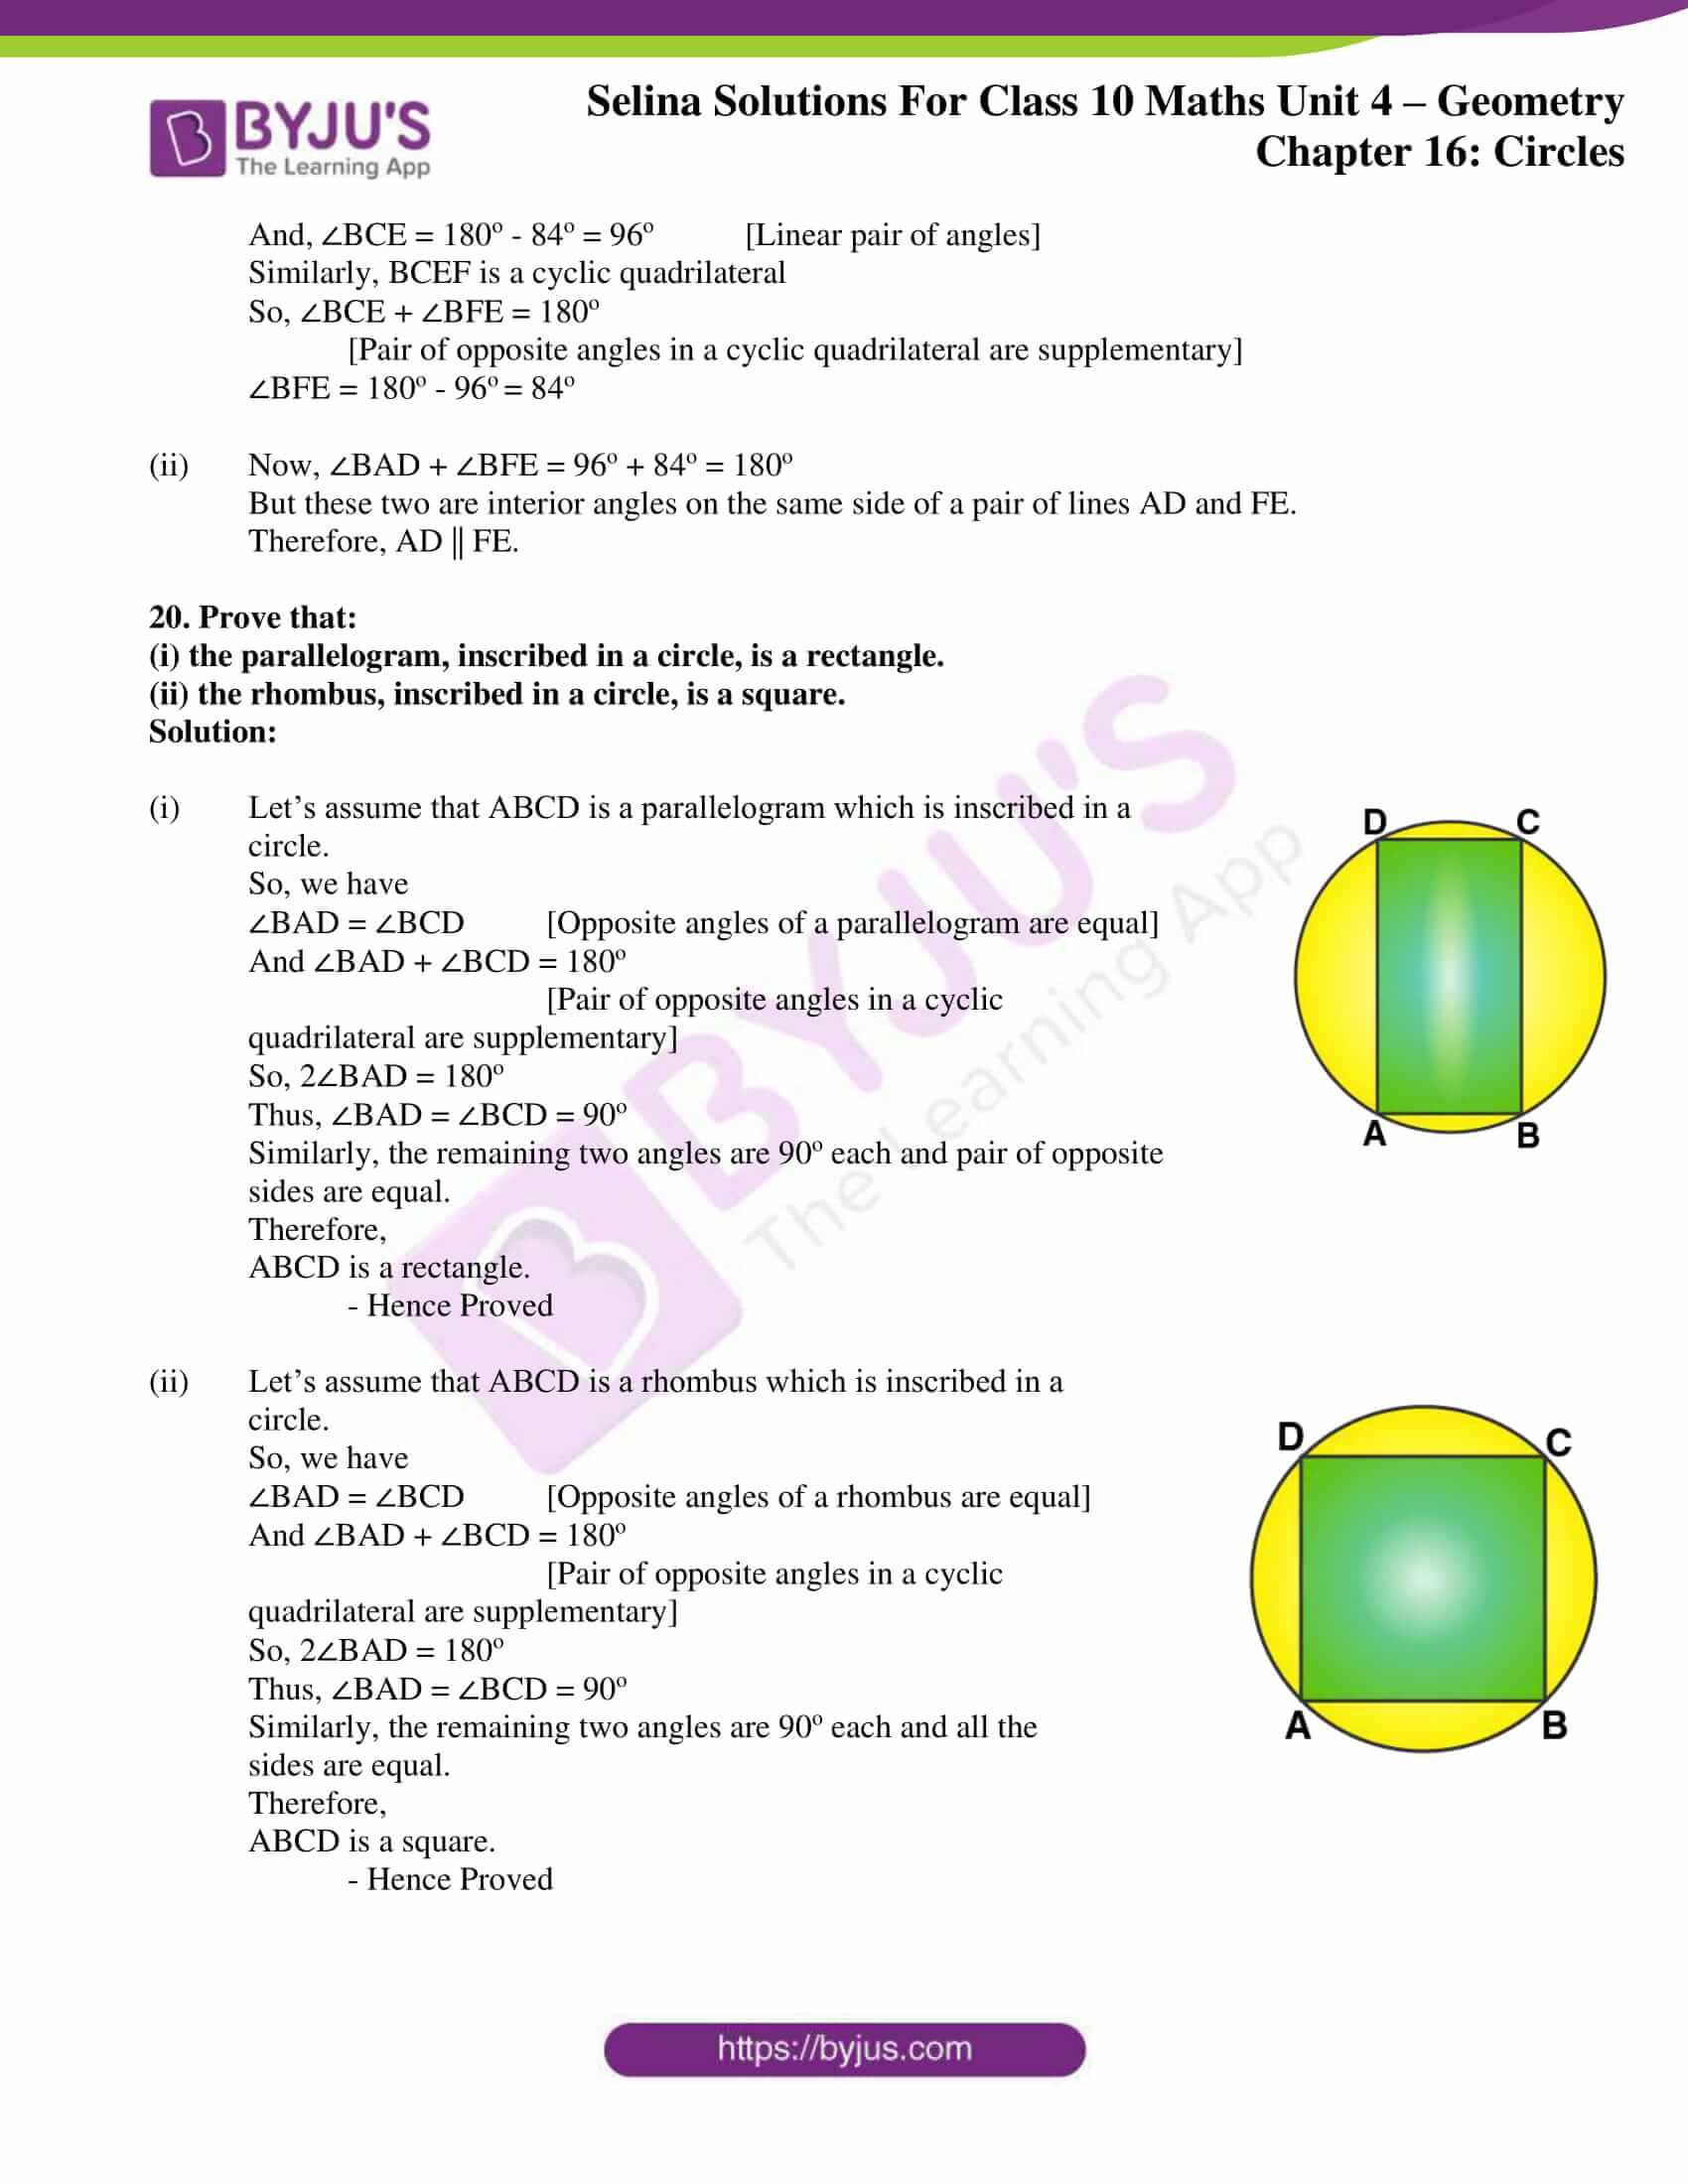 selina-sol-maths-class-10-ch-17-ex-a-11